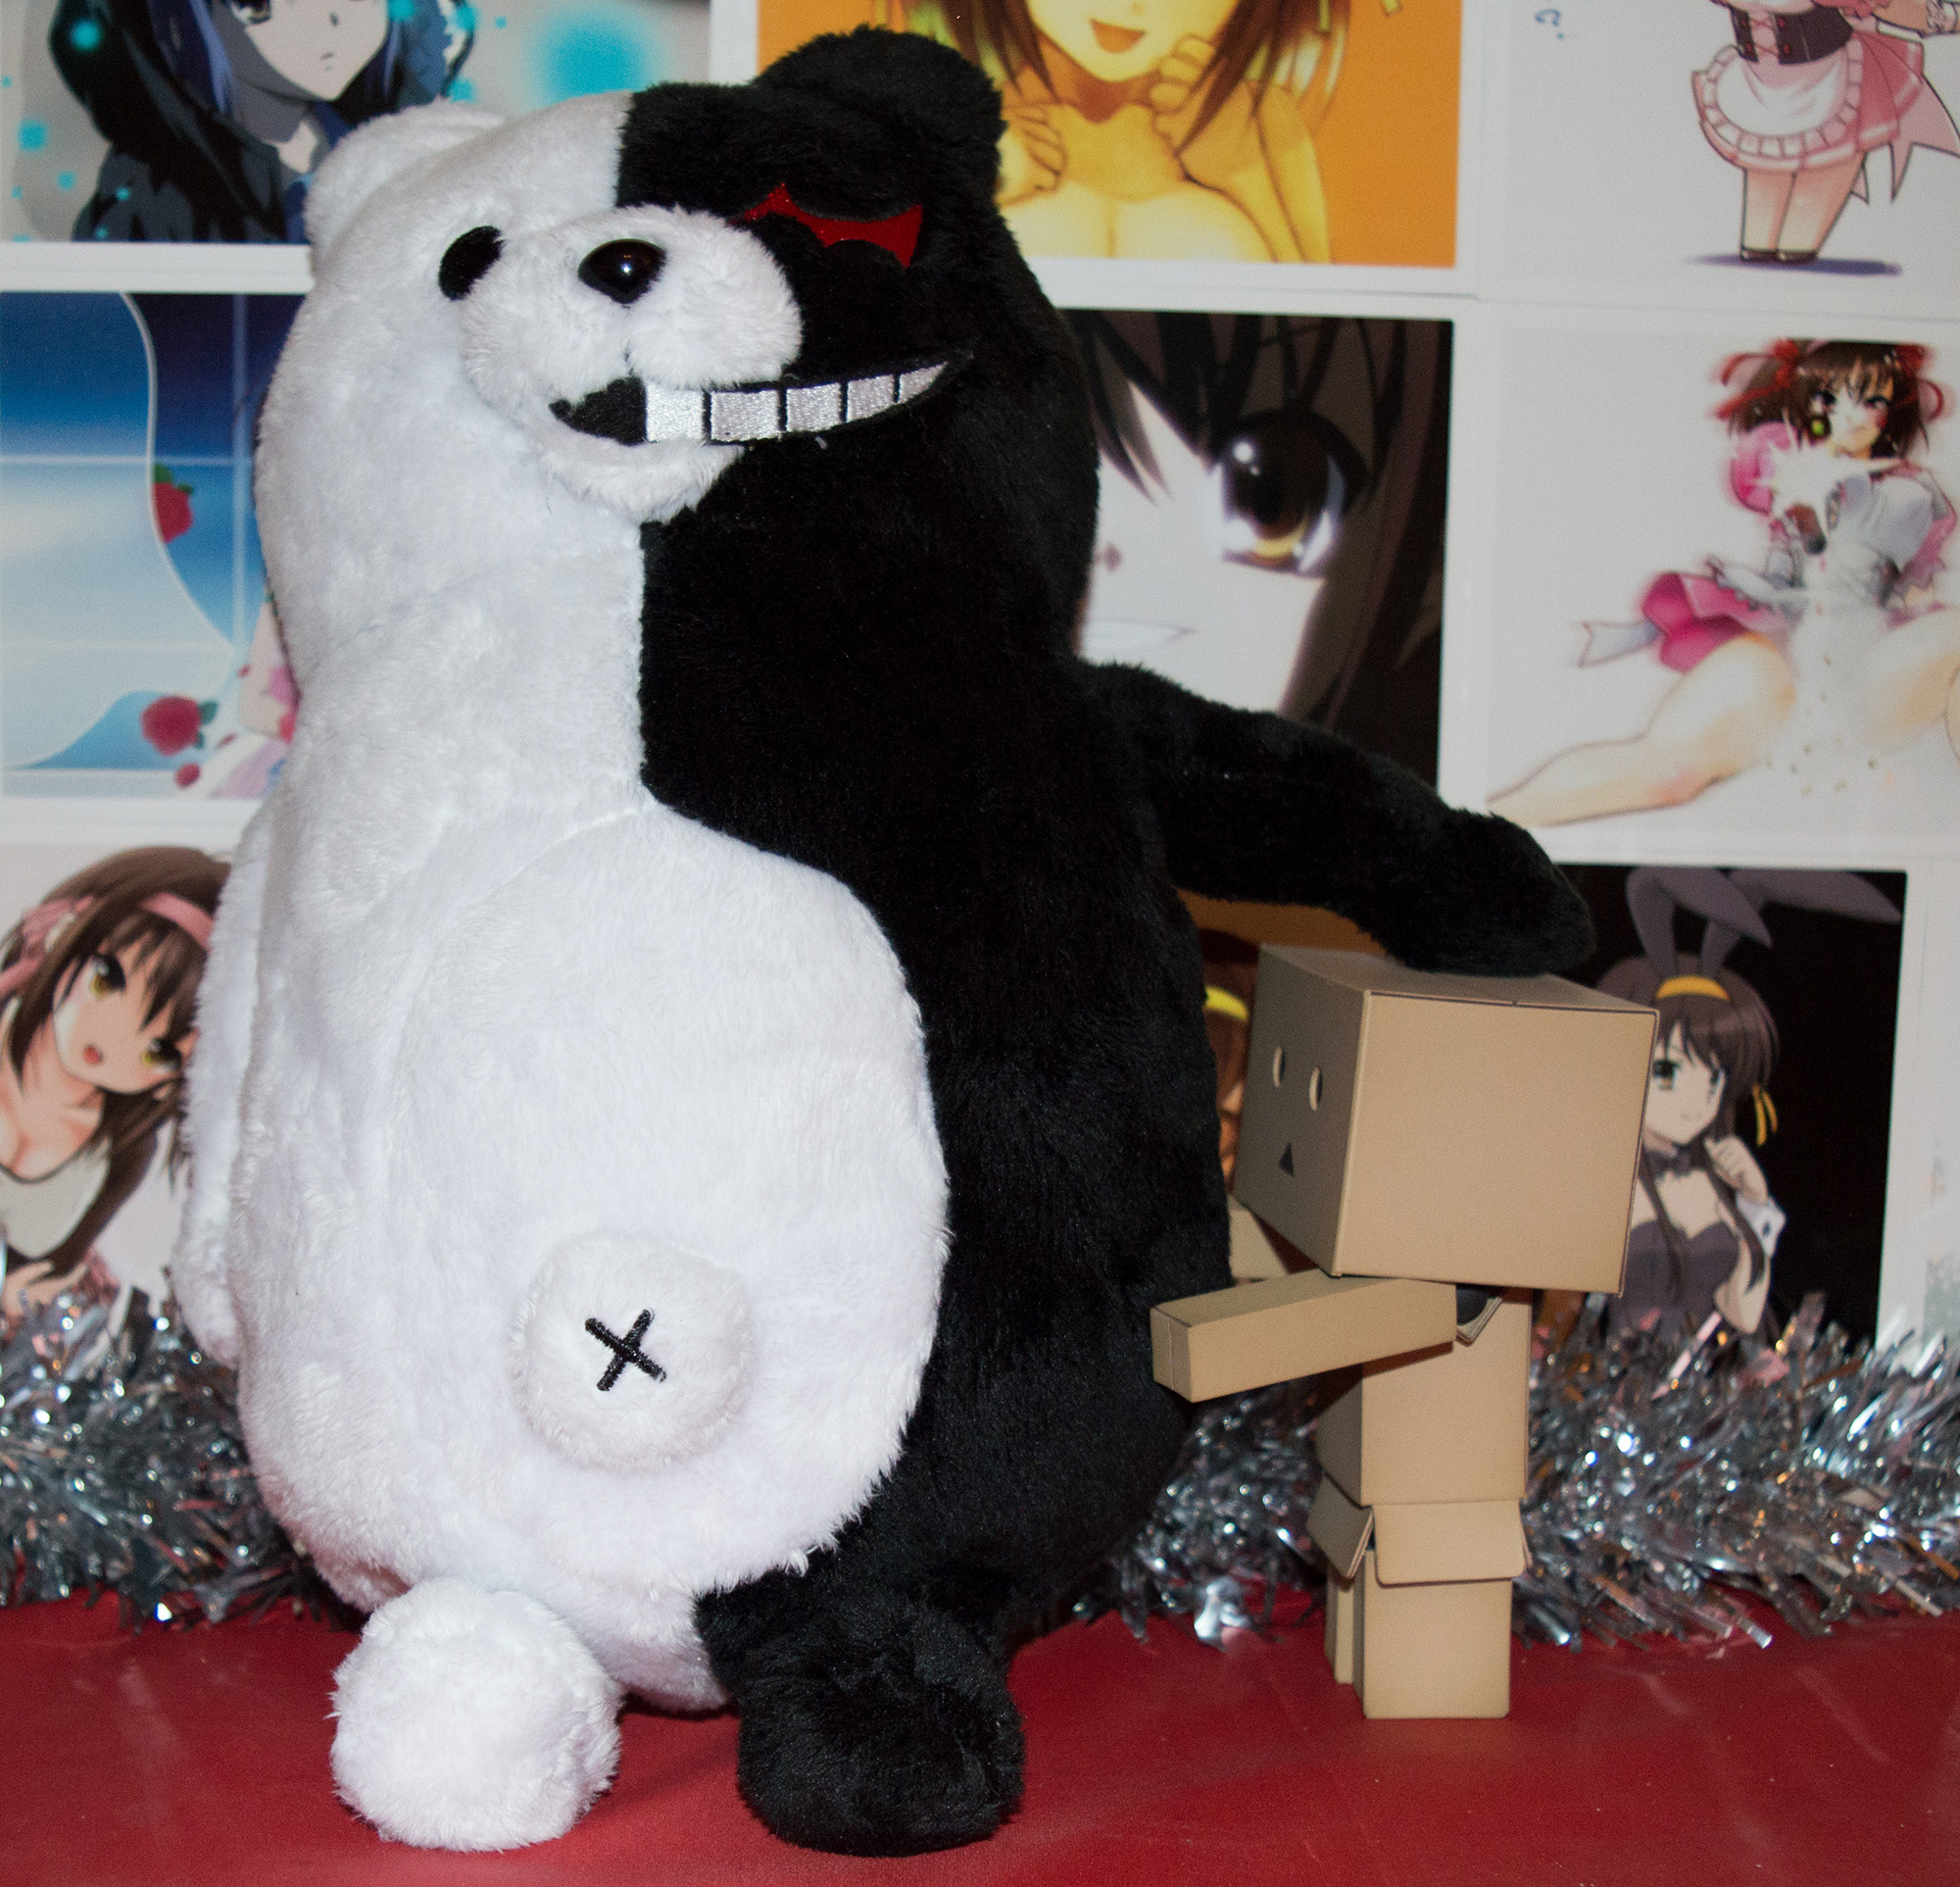 JList Fuku-Bukuro Lucky Anime Toy Set Overview haruhichan.com Danganronpa - Monokuma Plush